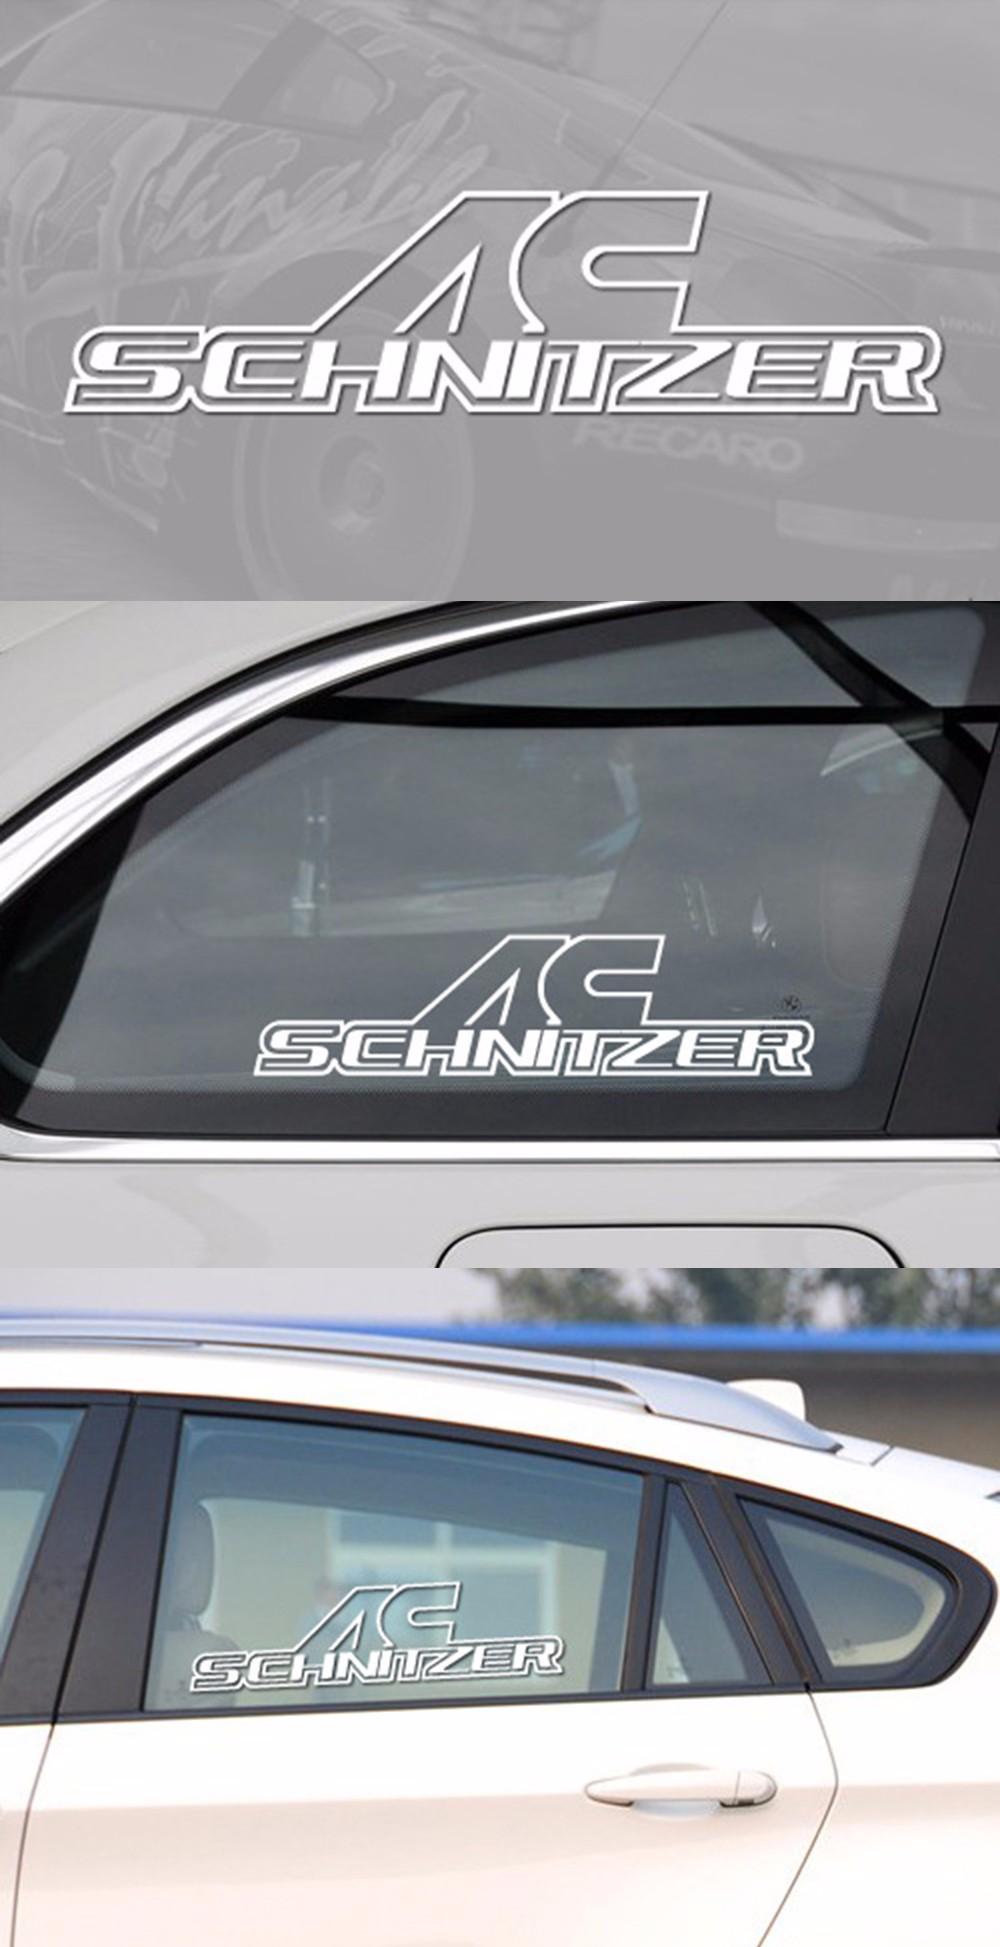 New Style AC Schnitzer Window Car Body Stickers Car Decals for BMW